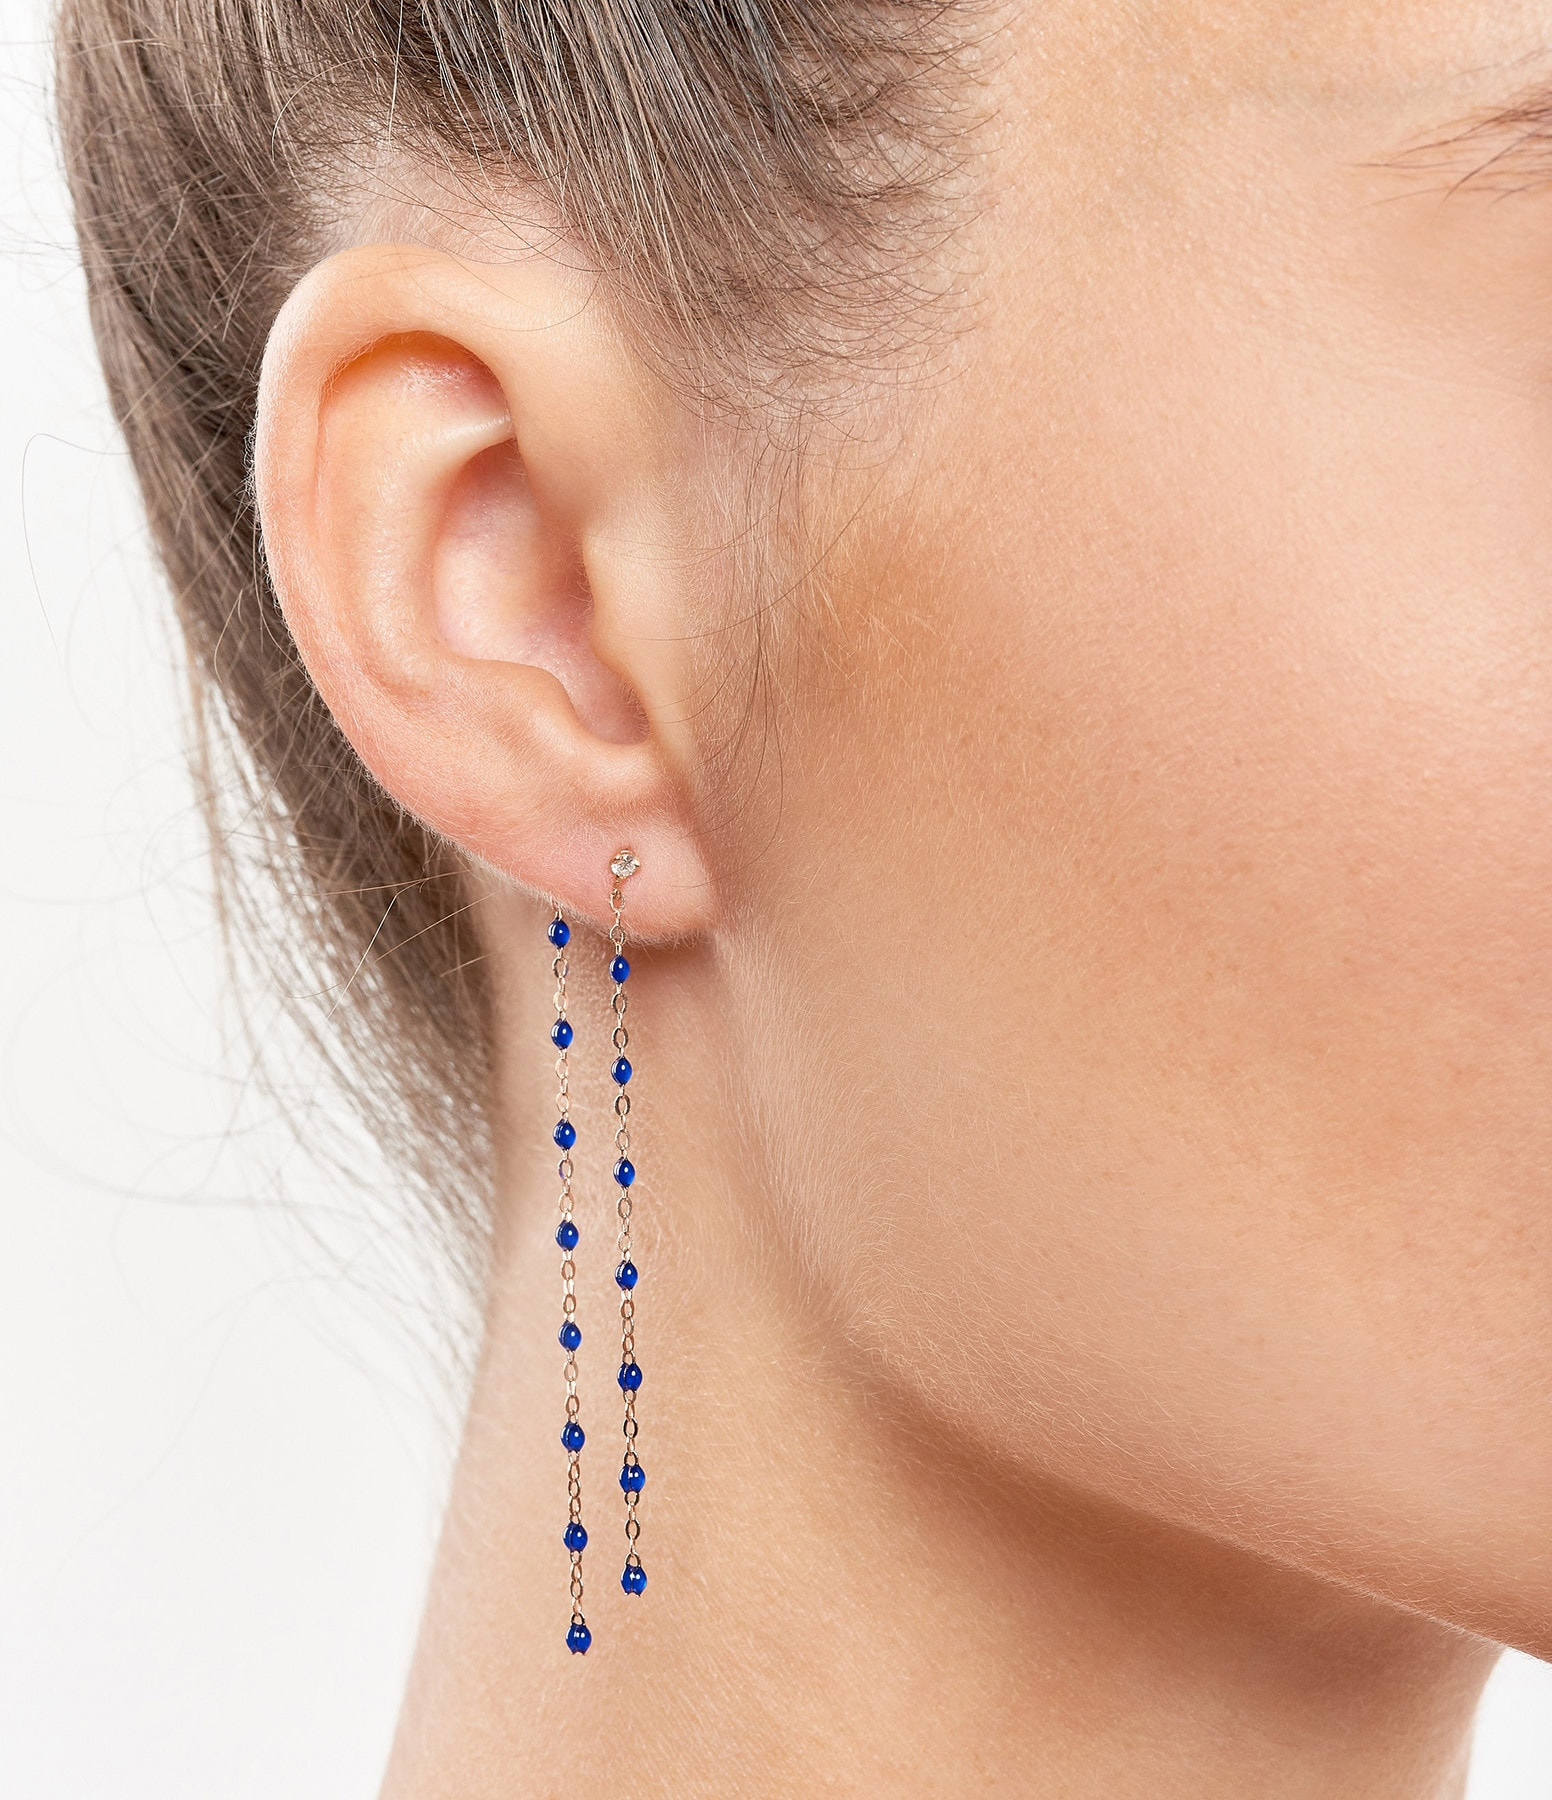 GIGI CLOZEAU - Boucles d'oreilles Pendantes Perles Résine DiamsOG